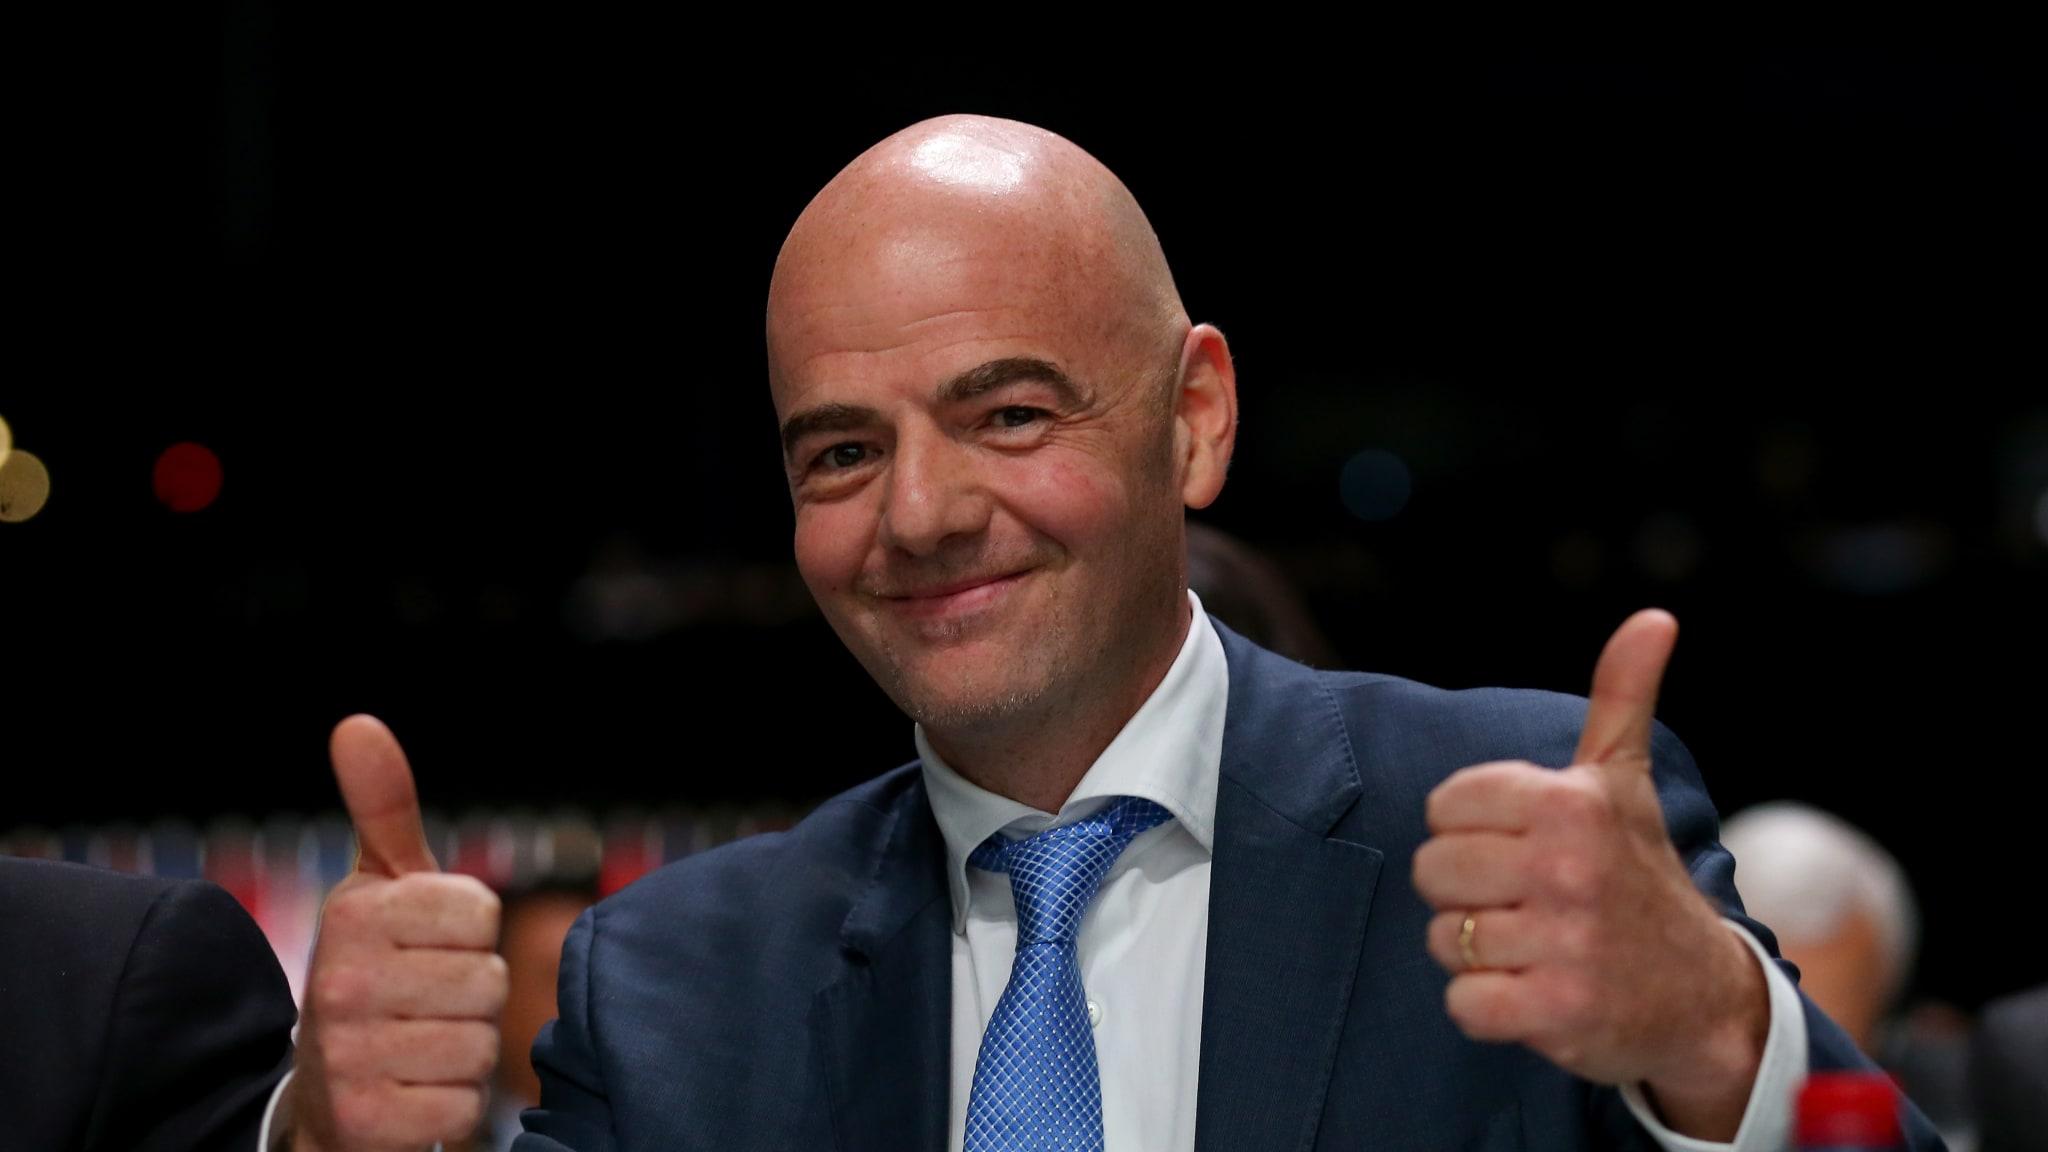 Подозреваемый в коррупции Инфантино сохраняет пост президента ФИФА - фото